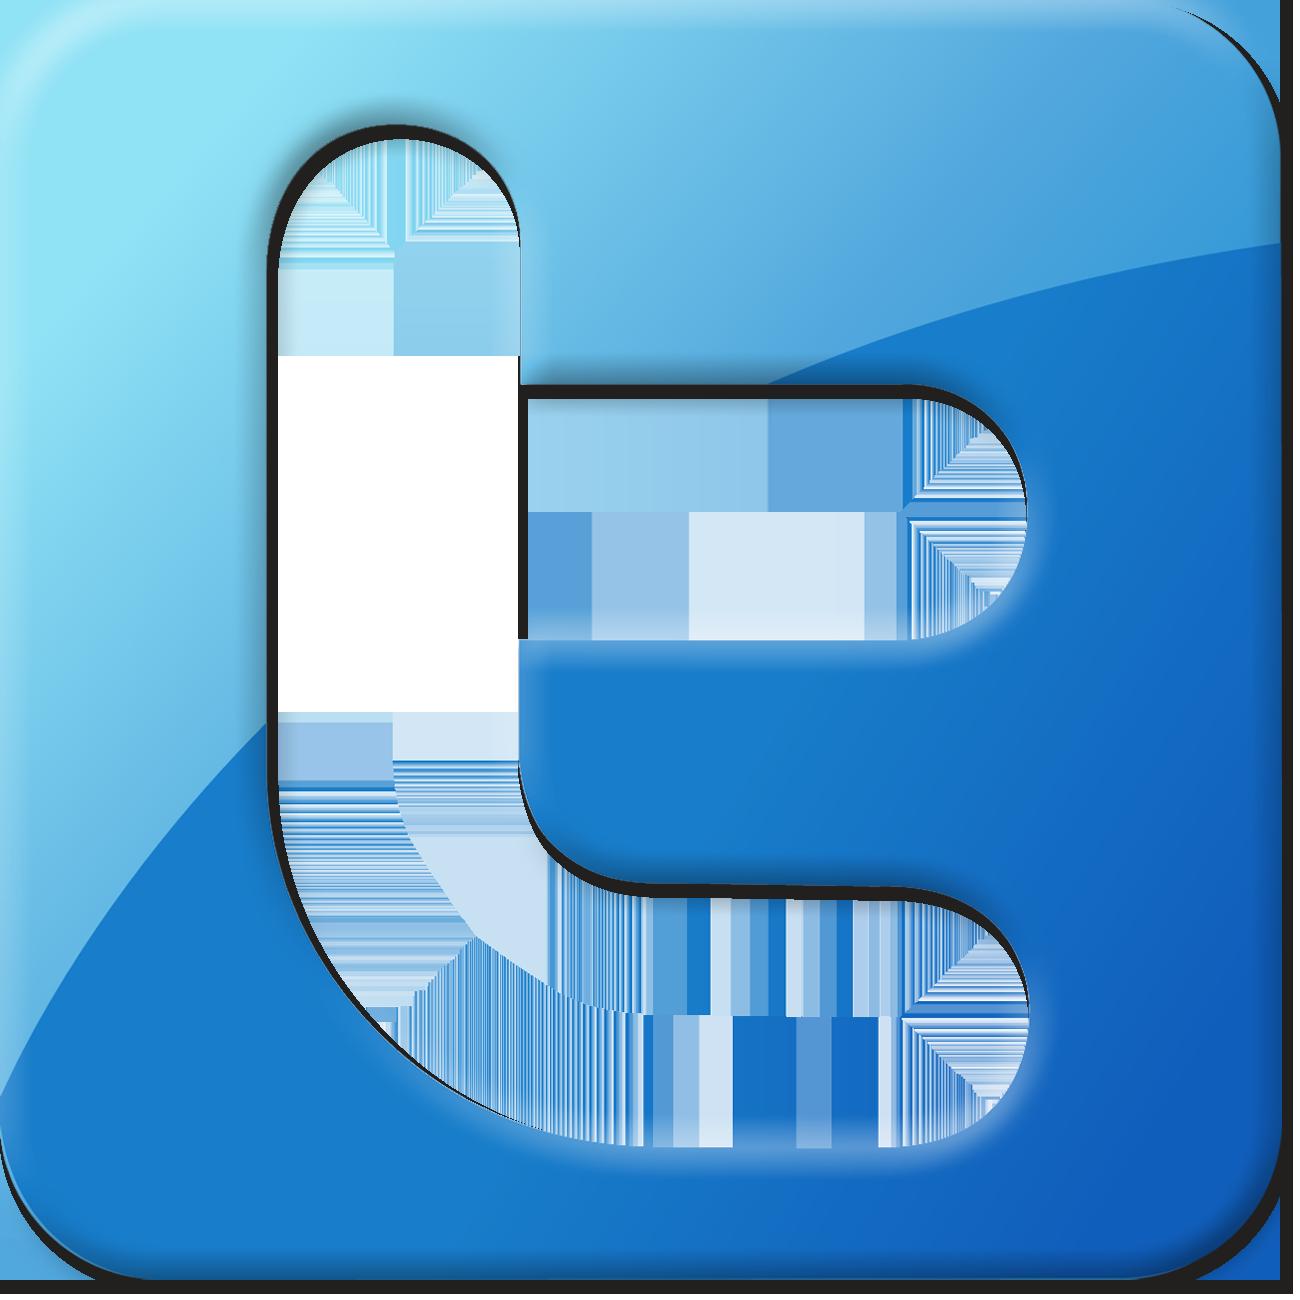 Hq transparent images pluspng. Twitter logo png